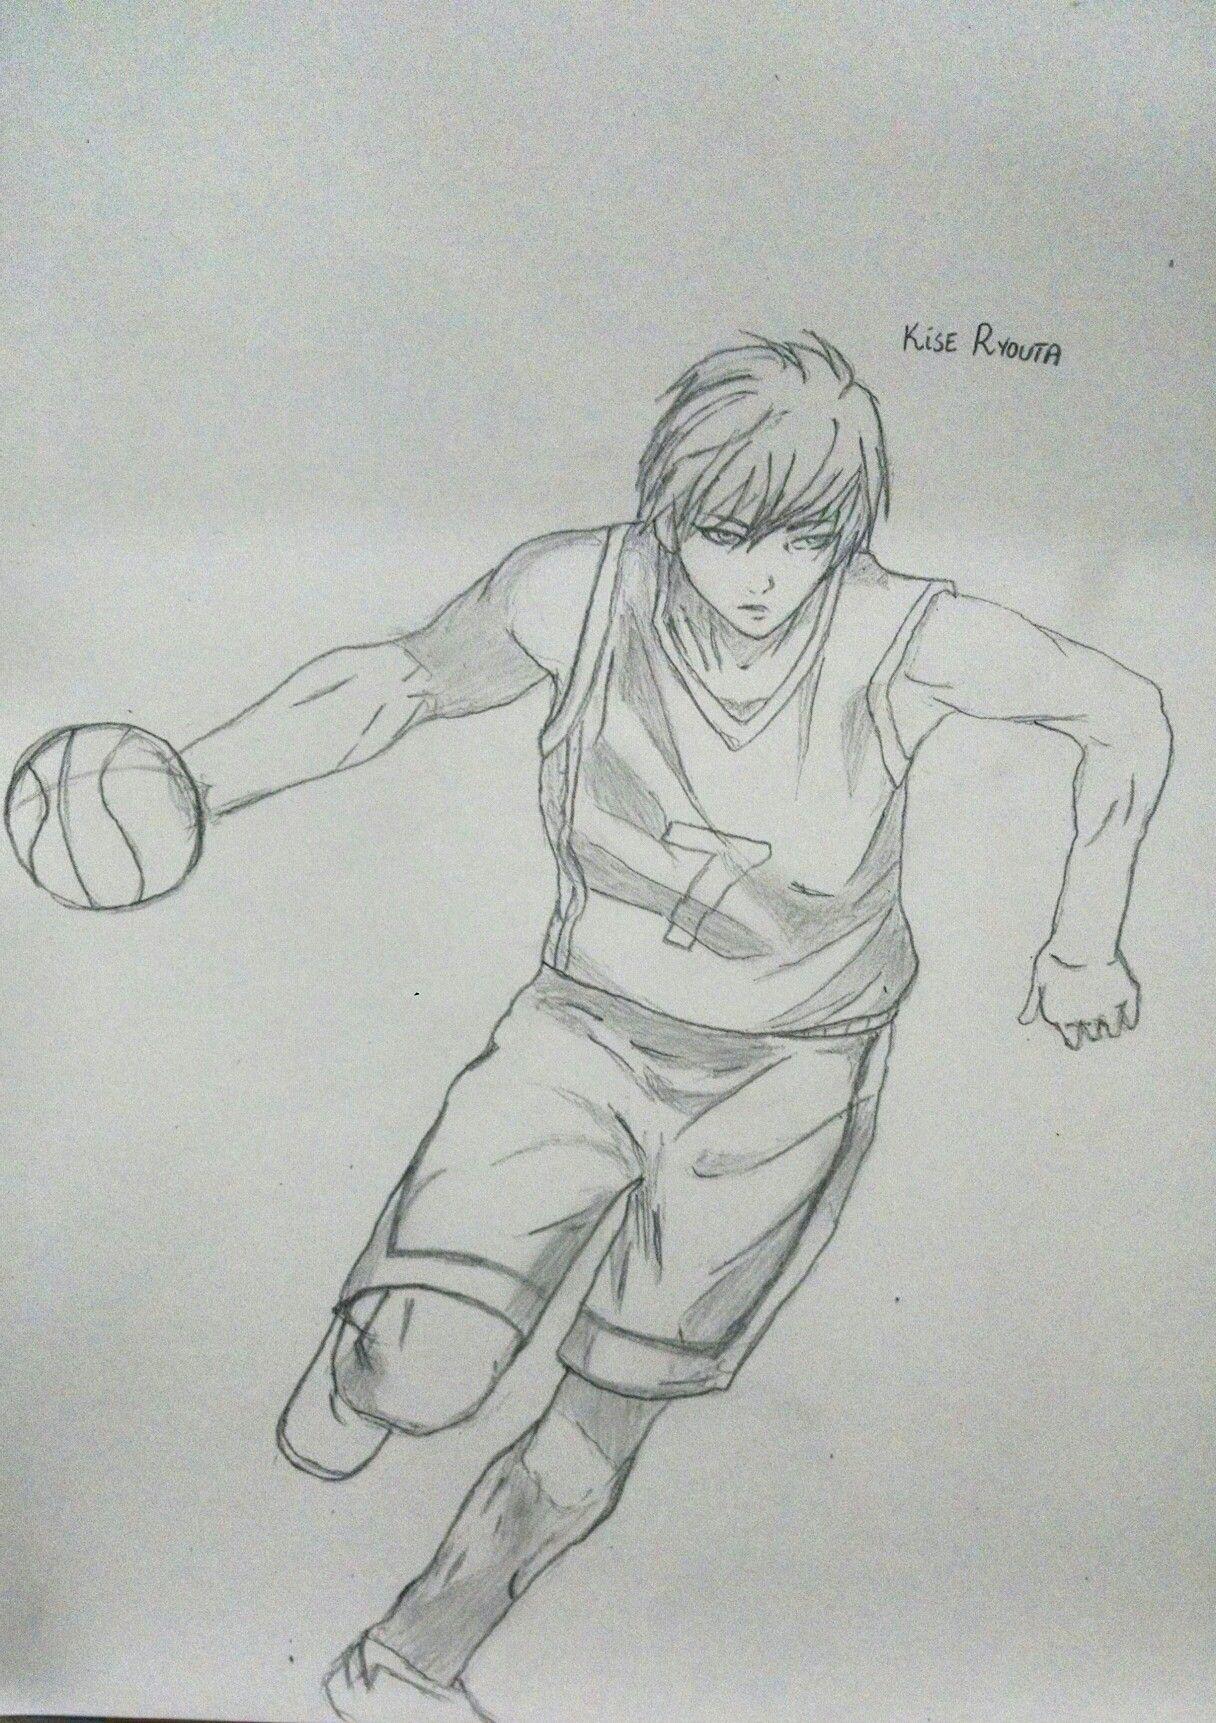 Kise ryouta sketch pencil art kuroko no basuke anime